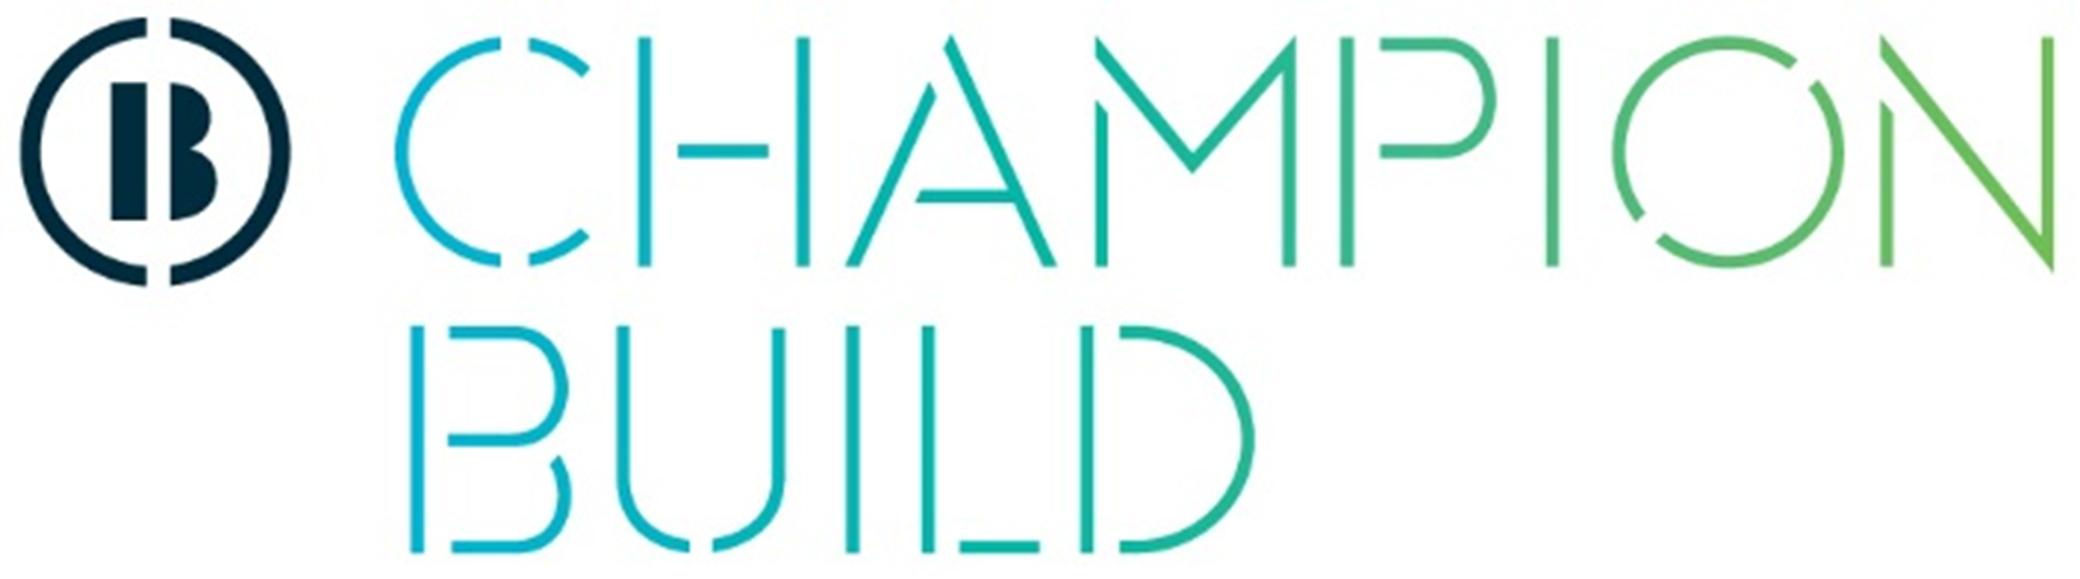 http://championbuild.co.uk/